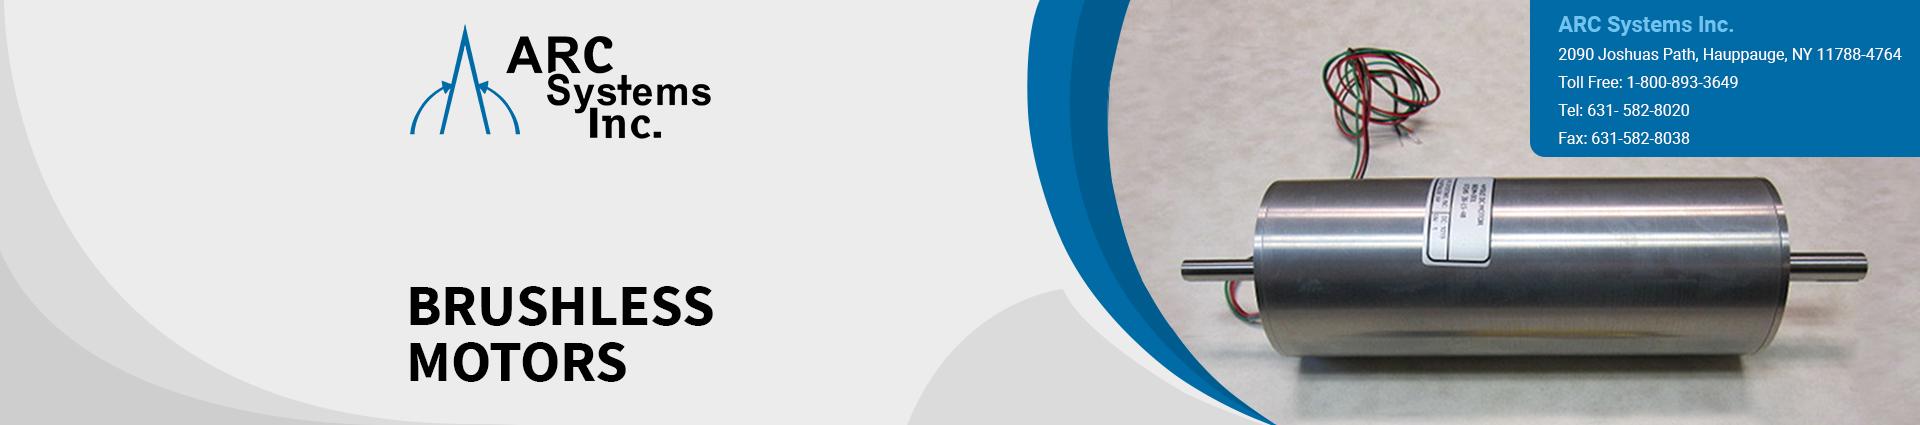 brushless-motors banner ARC Systems Inc